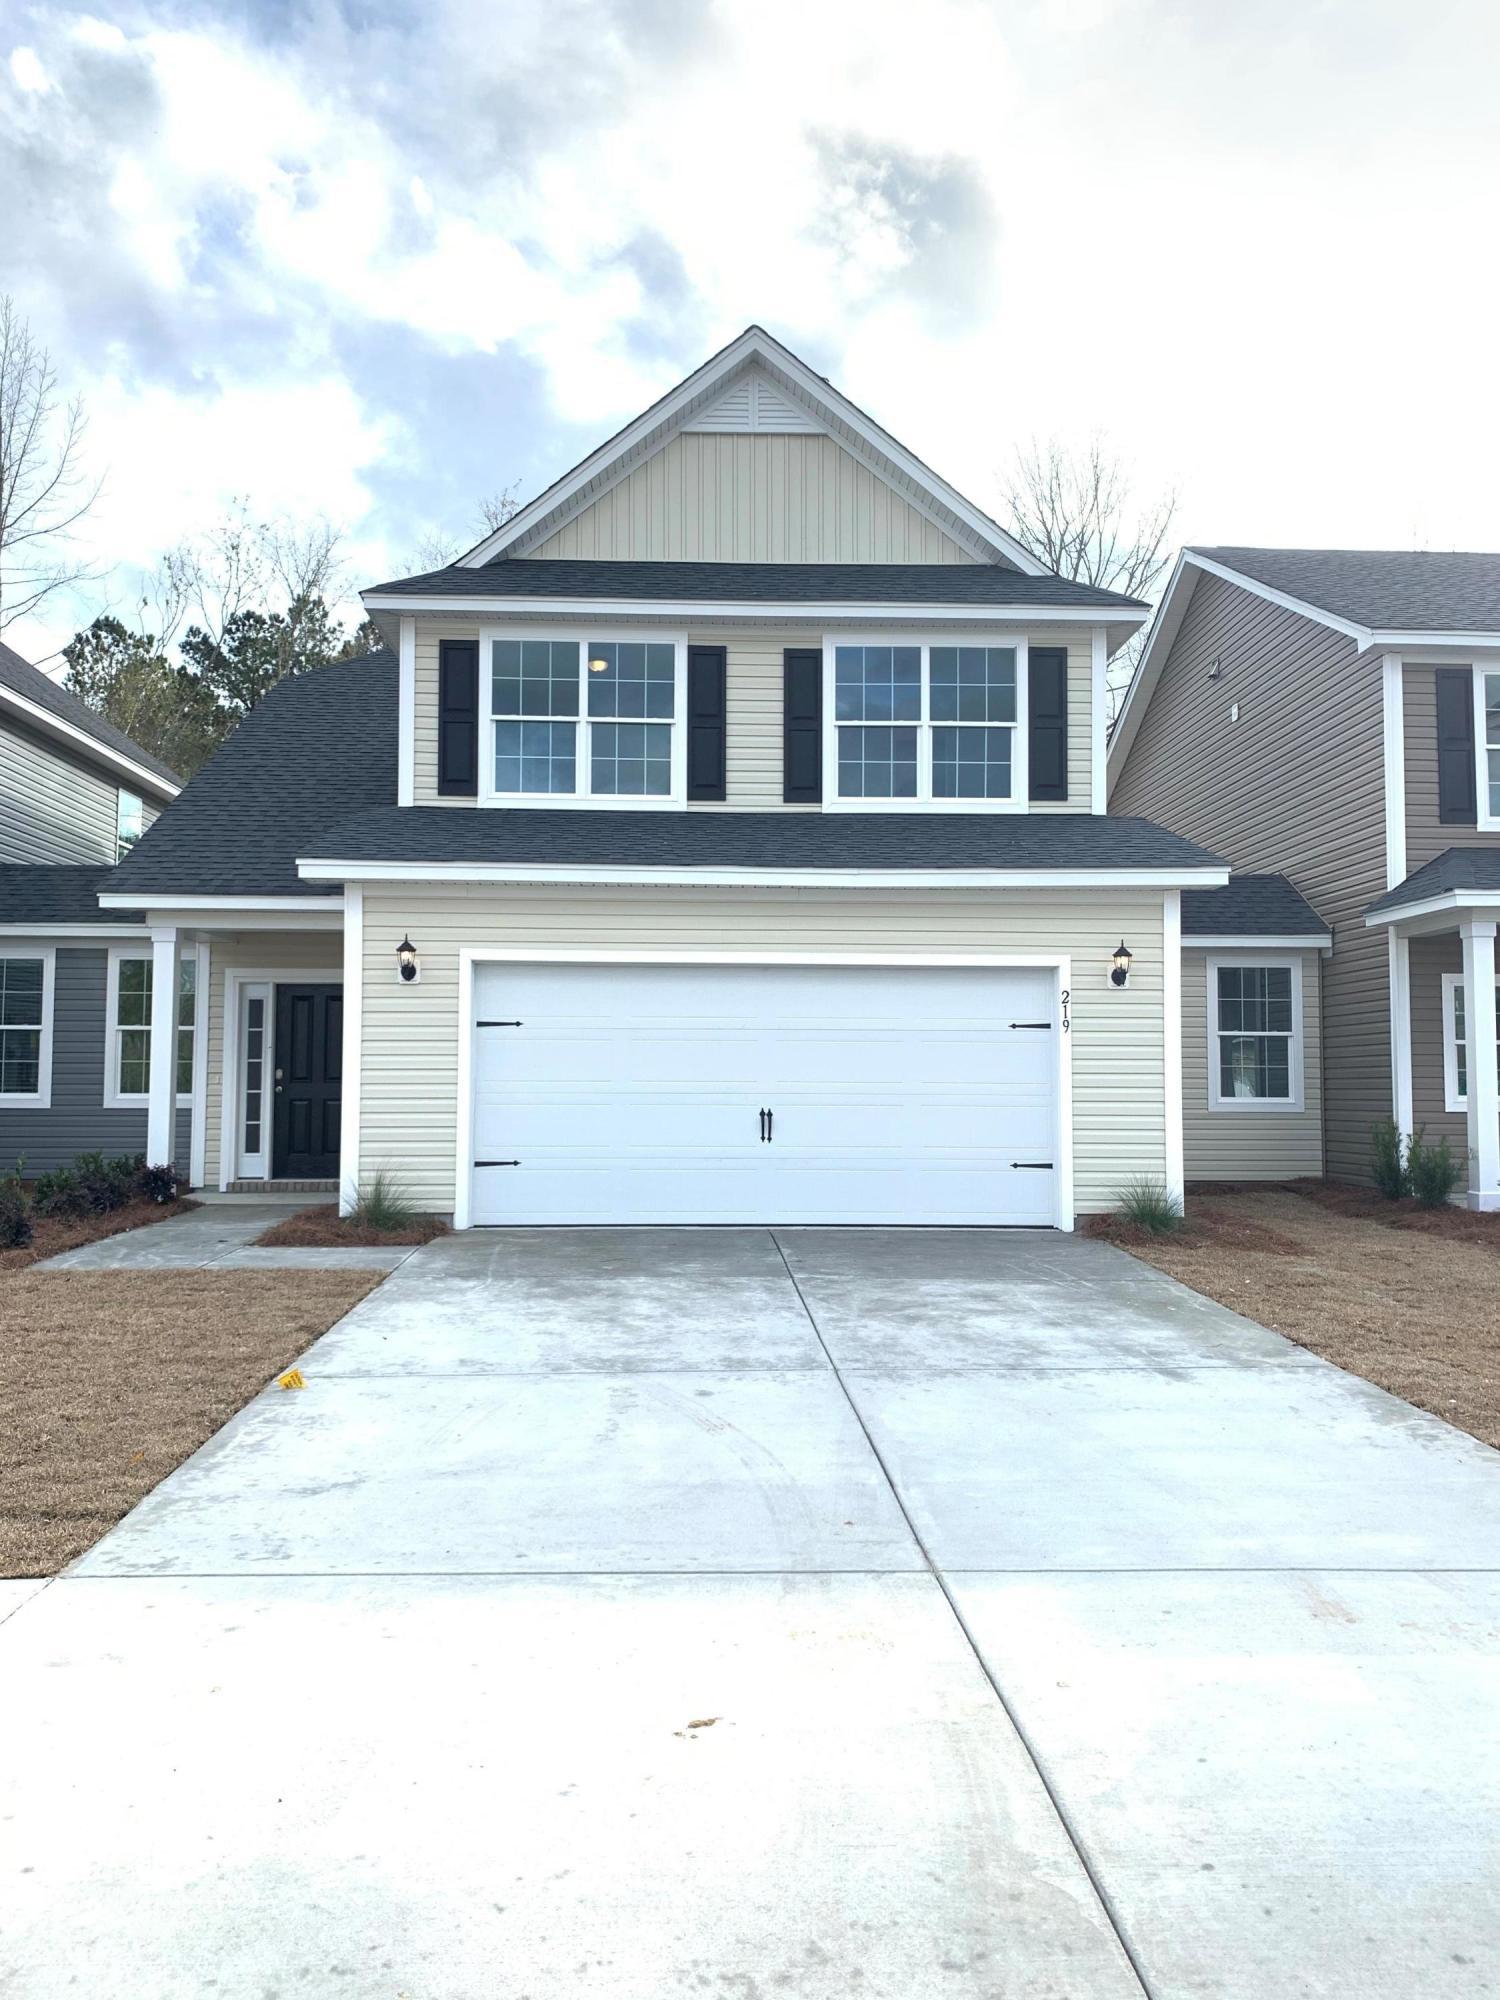 Hampton Woods Homes For Sale - 3 Mcclellan, Summerville, SC - 26